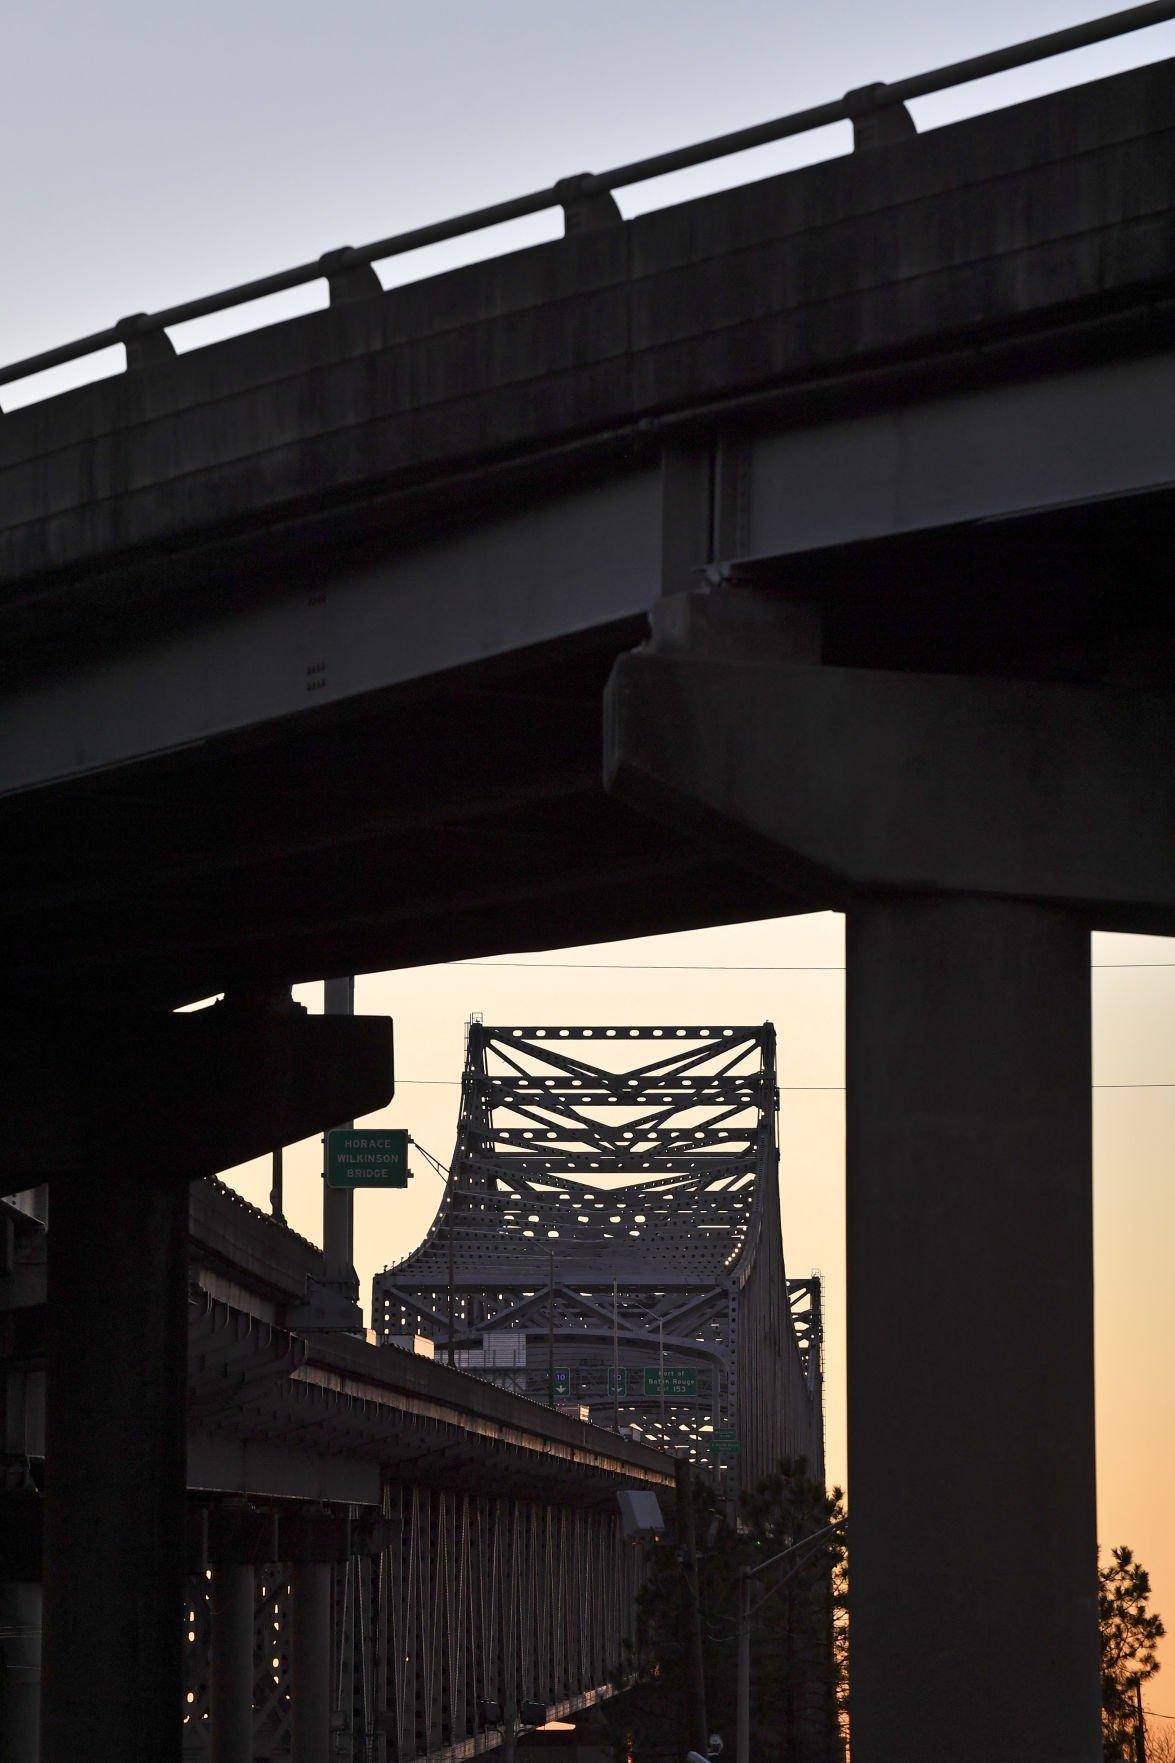 bridgesilhouette.adv_HS_072